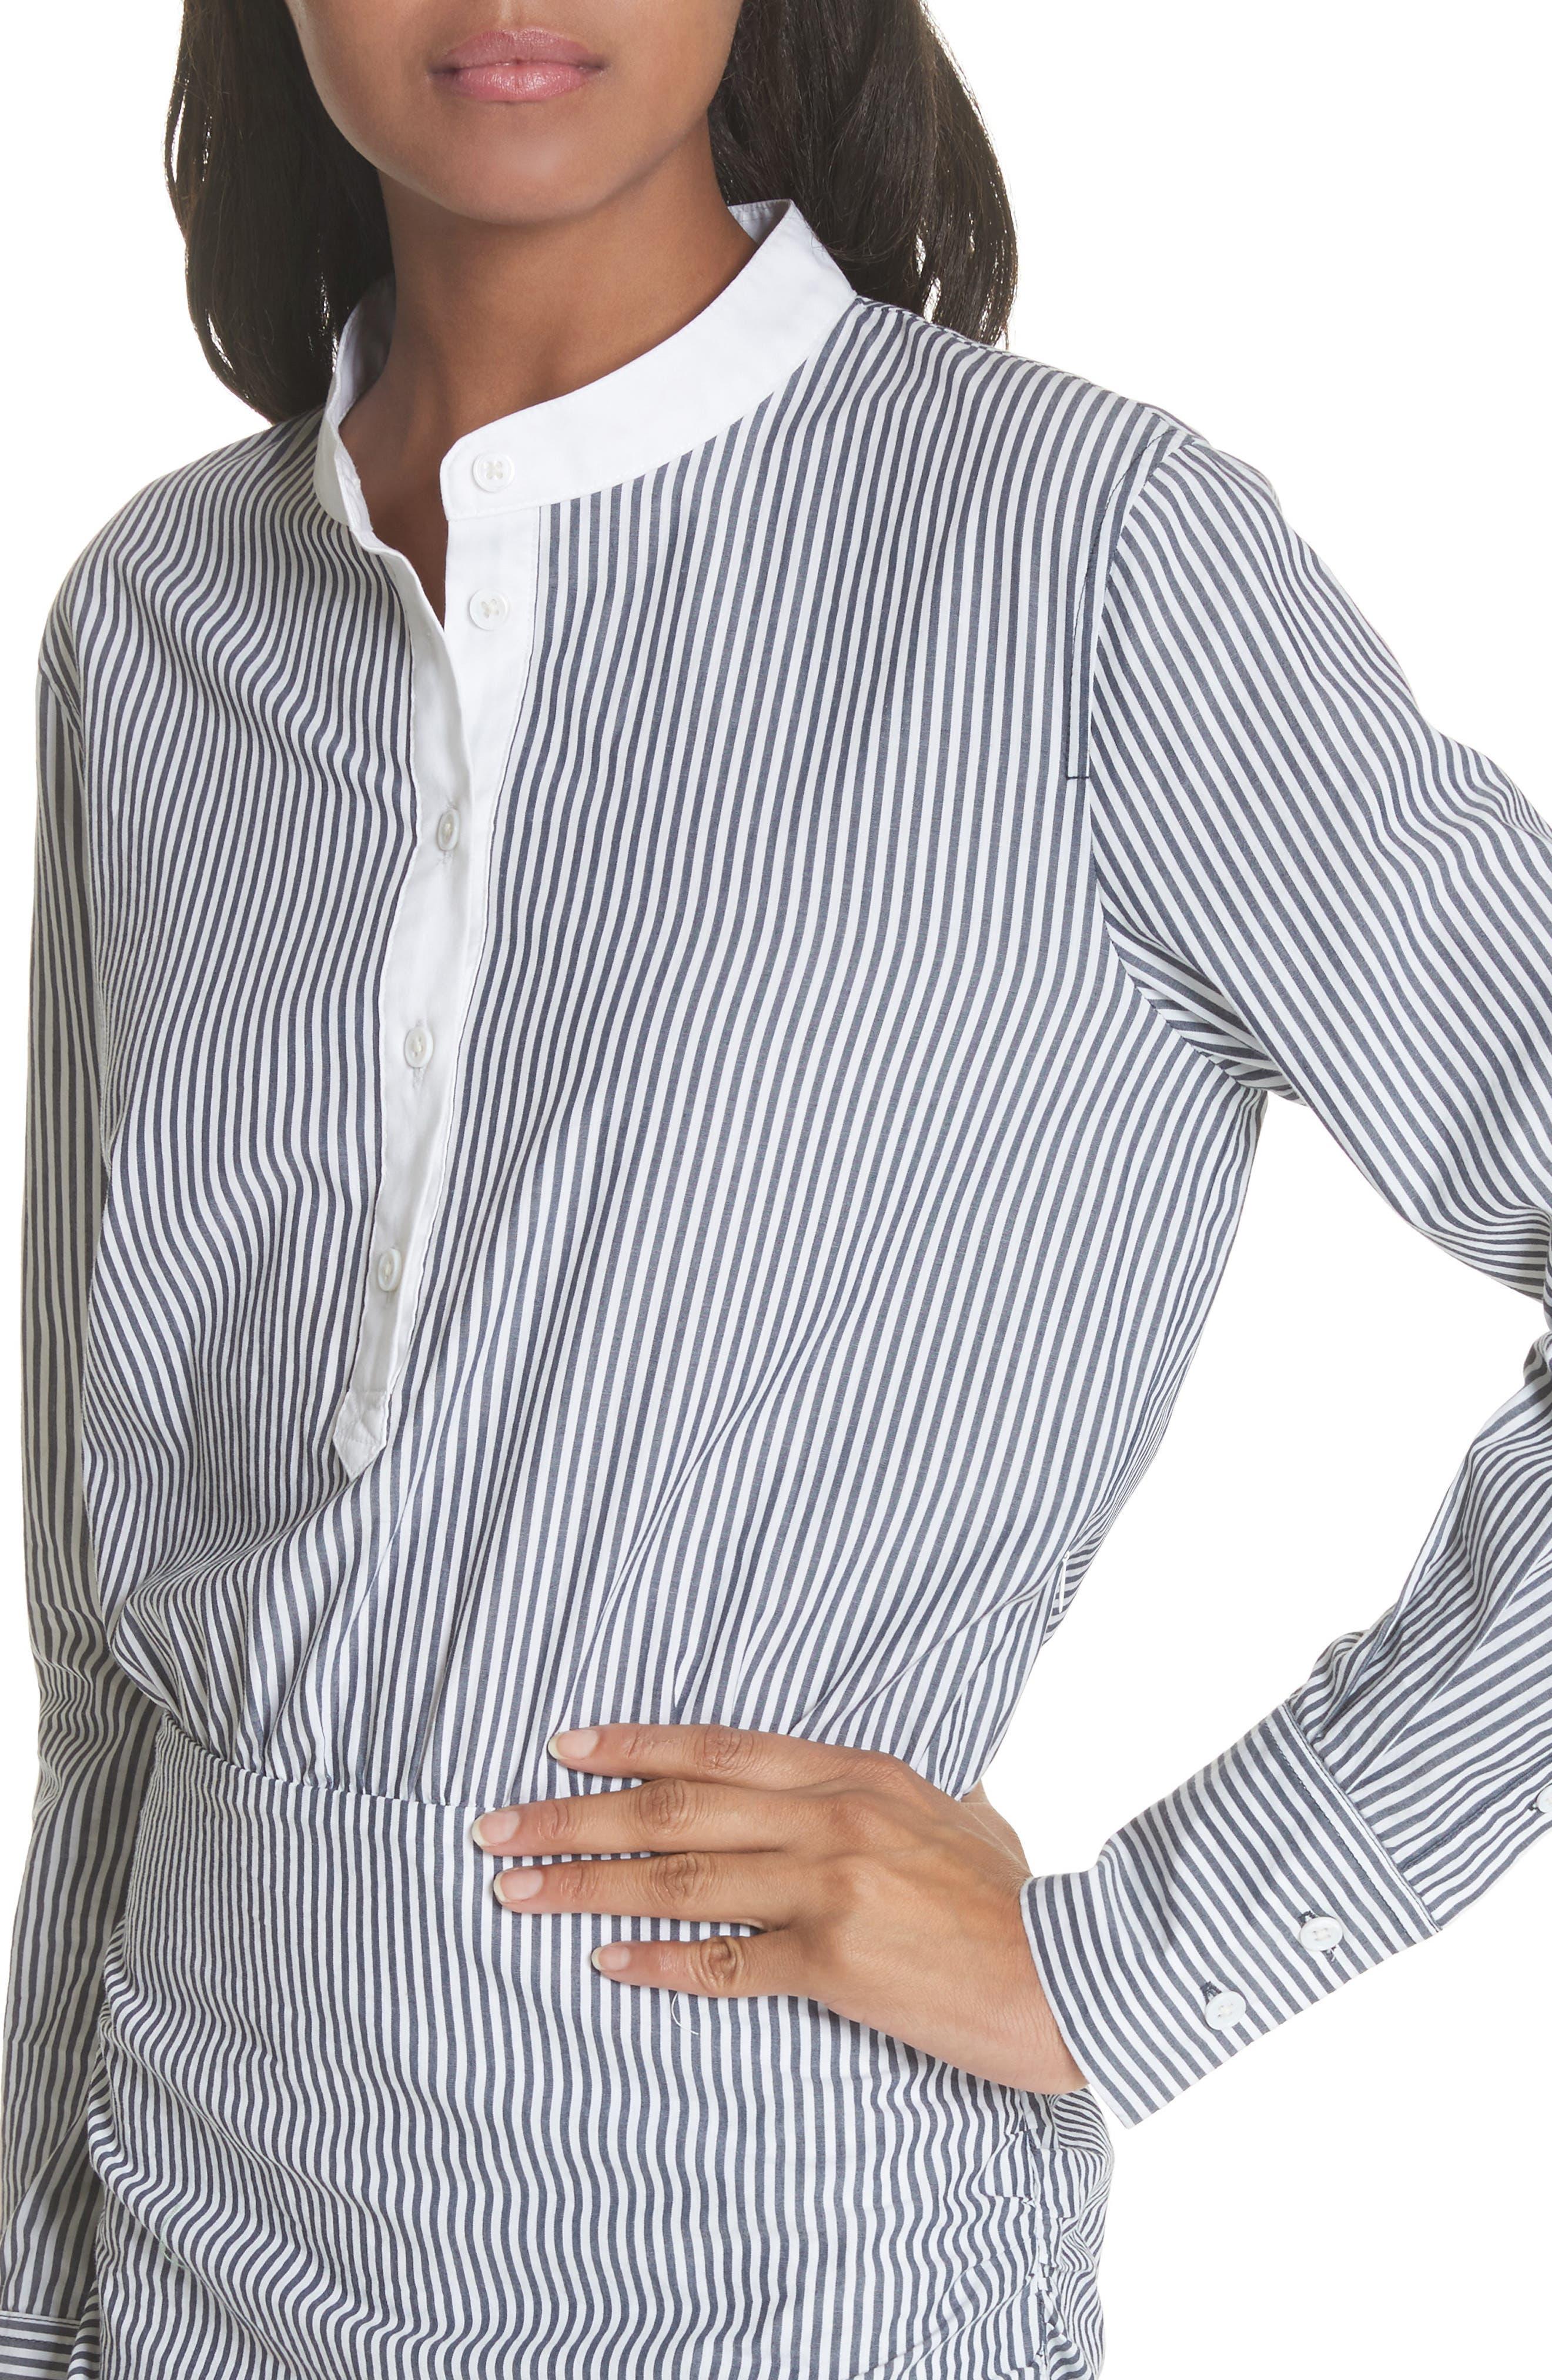 Everett Stripe Shirtdress,                             Alternate thumbnail 4, color,                             Black/ White Stripe